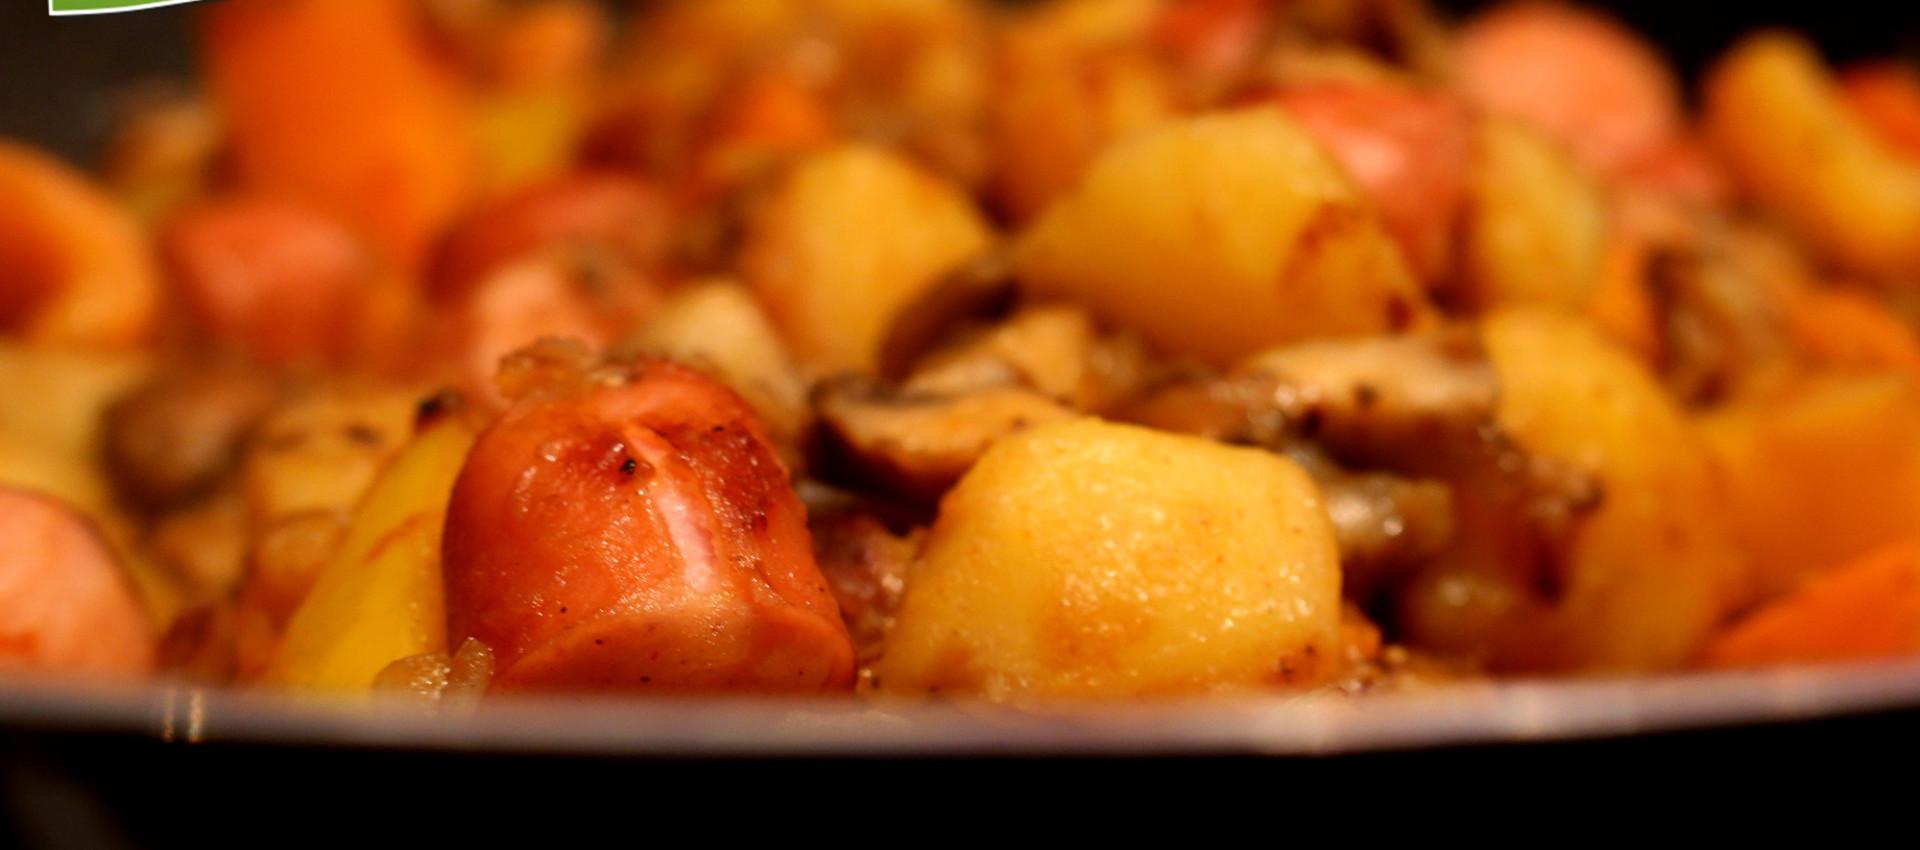 Rezept Kartoffel Eintopf mit Pilzen & Wurst - KochBock.de